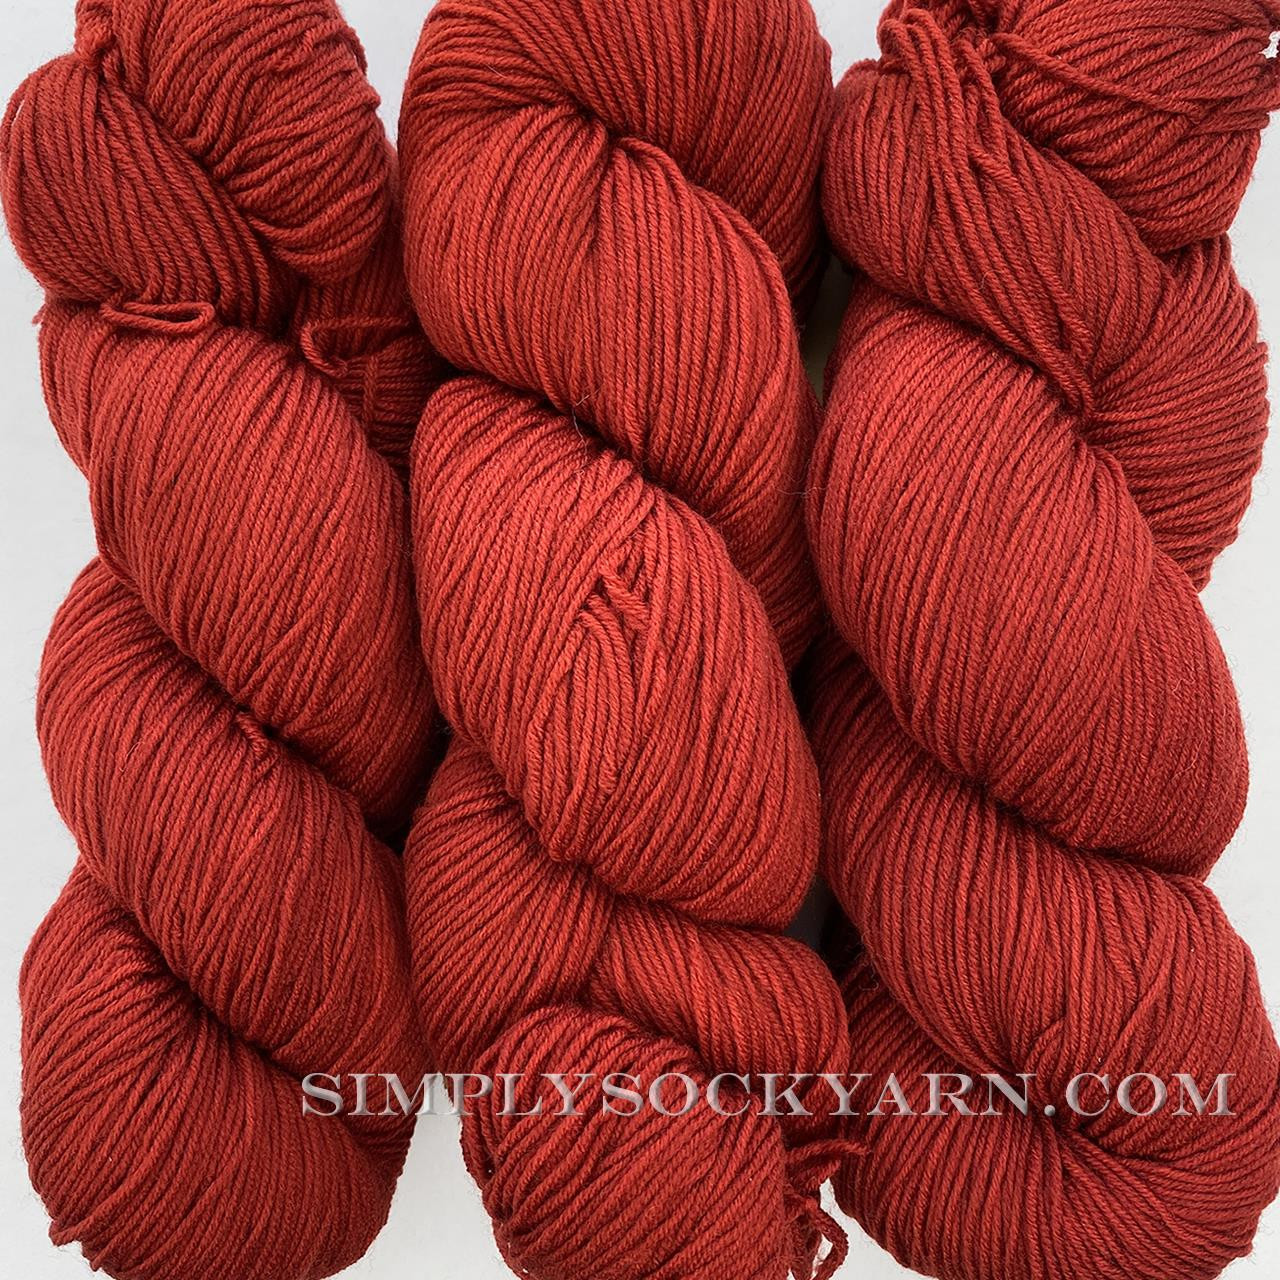 Urth Harvest Rubia -